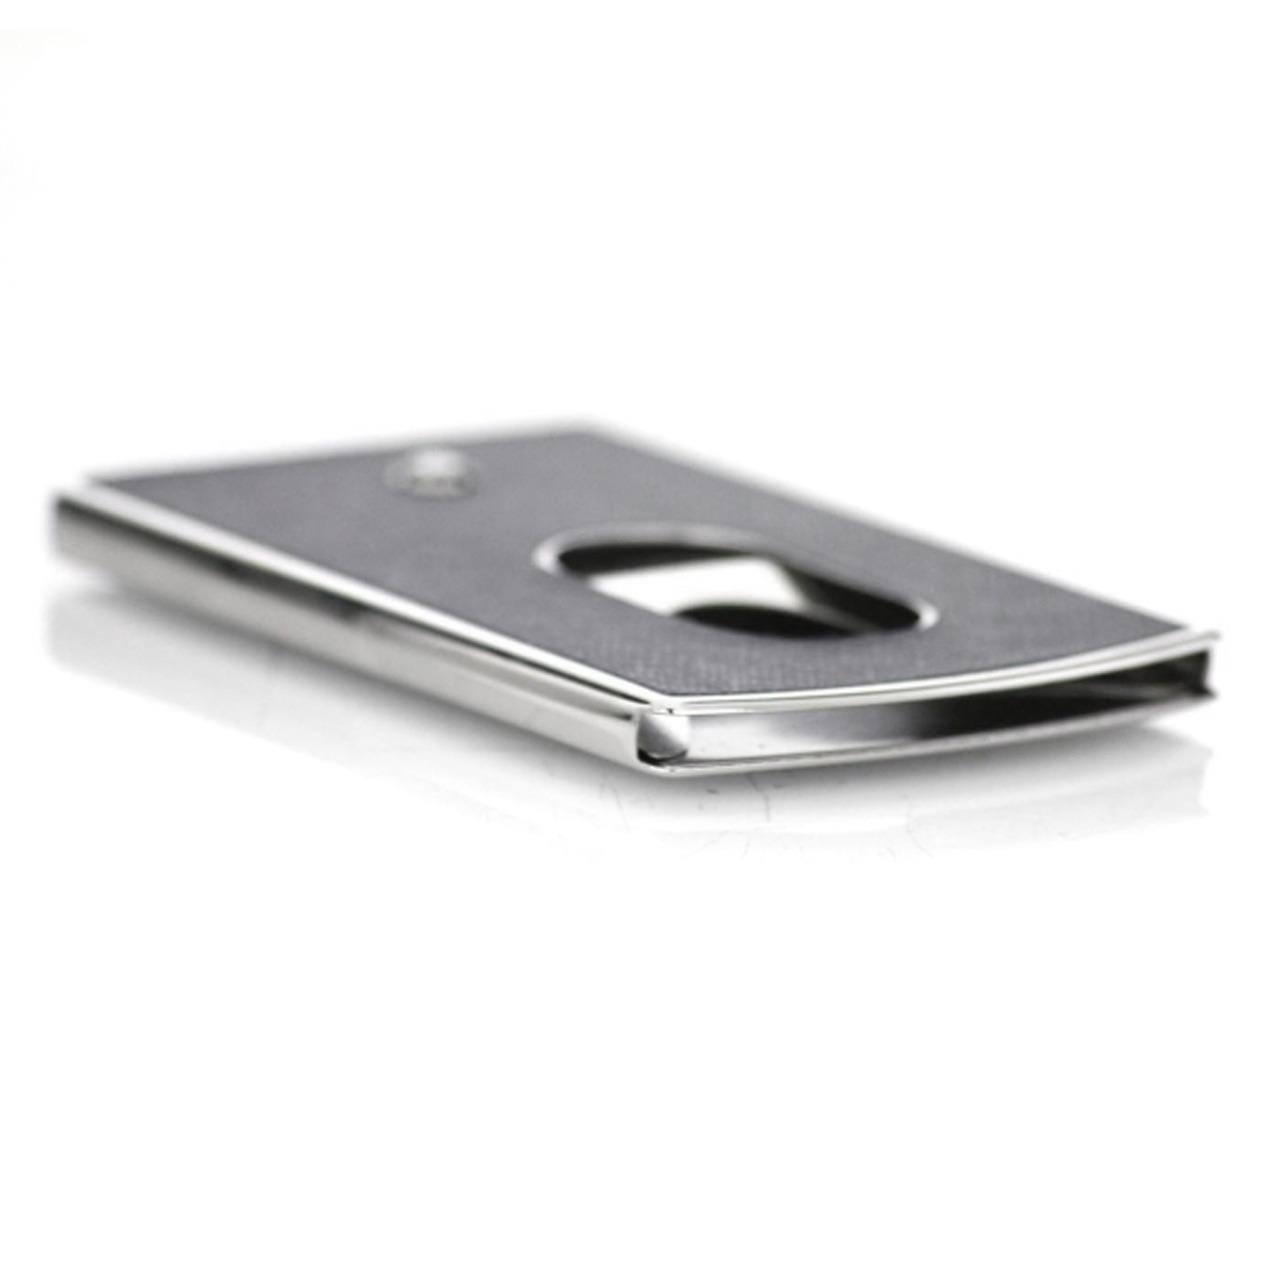 Business Card Holder Hard Shell Sartorial Dark Grey